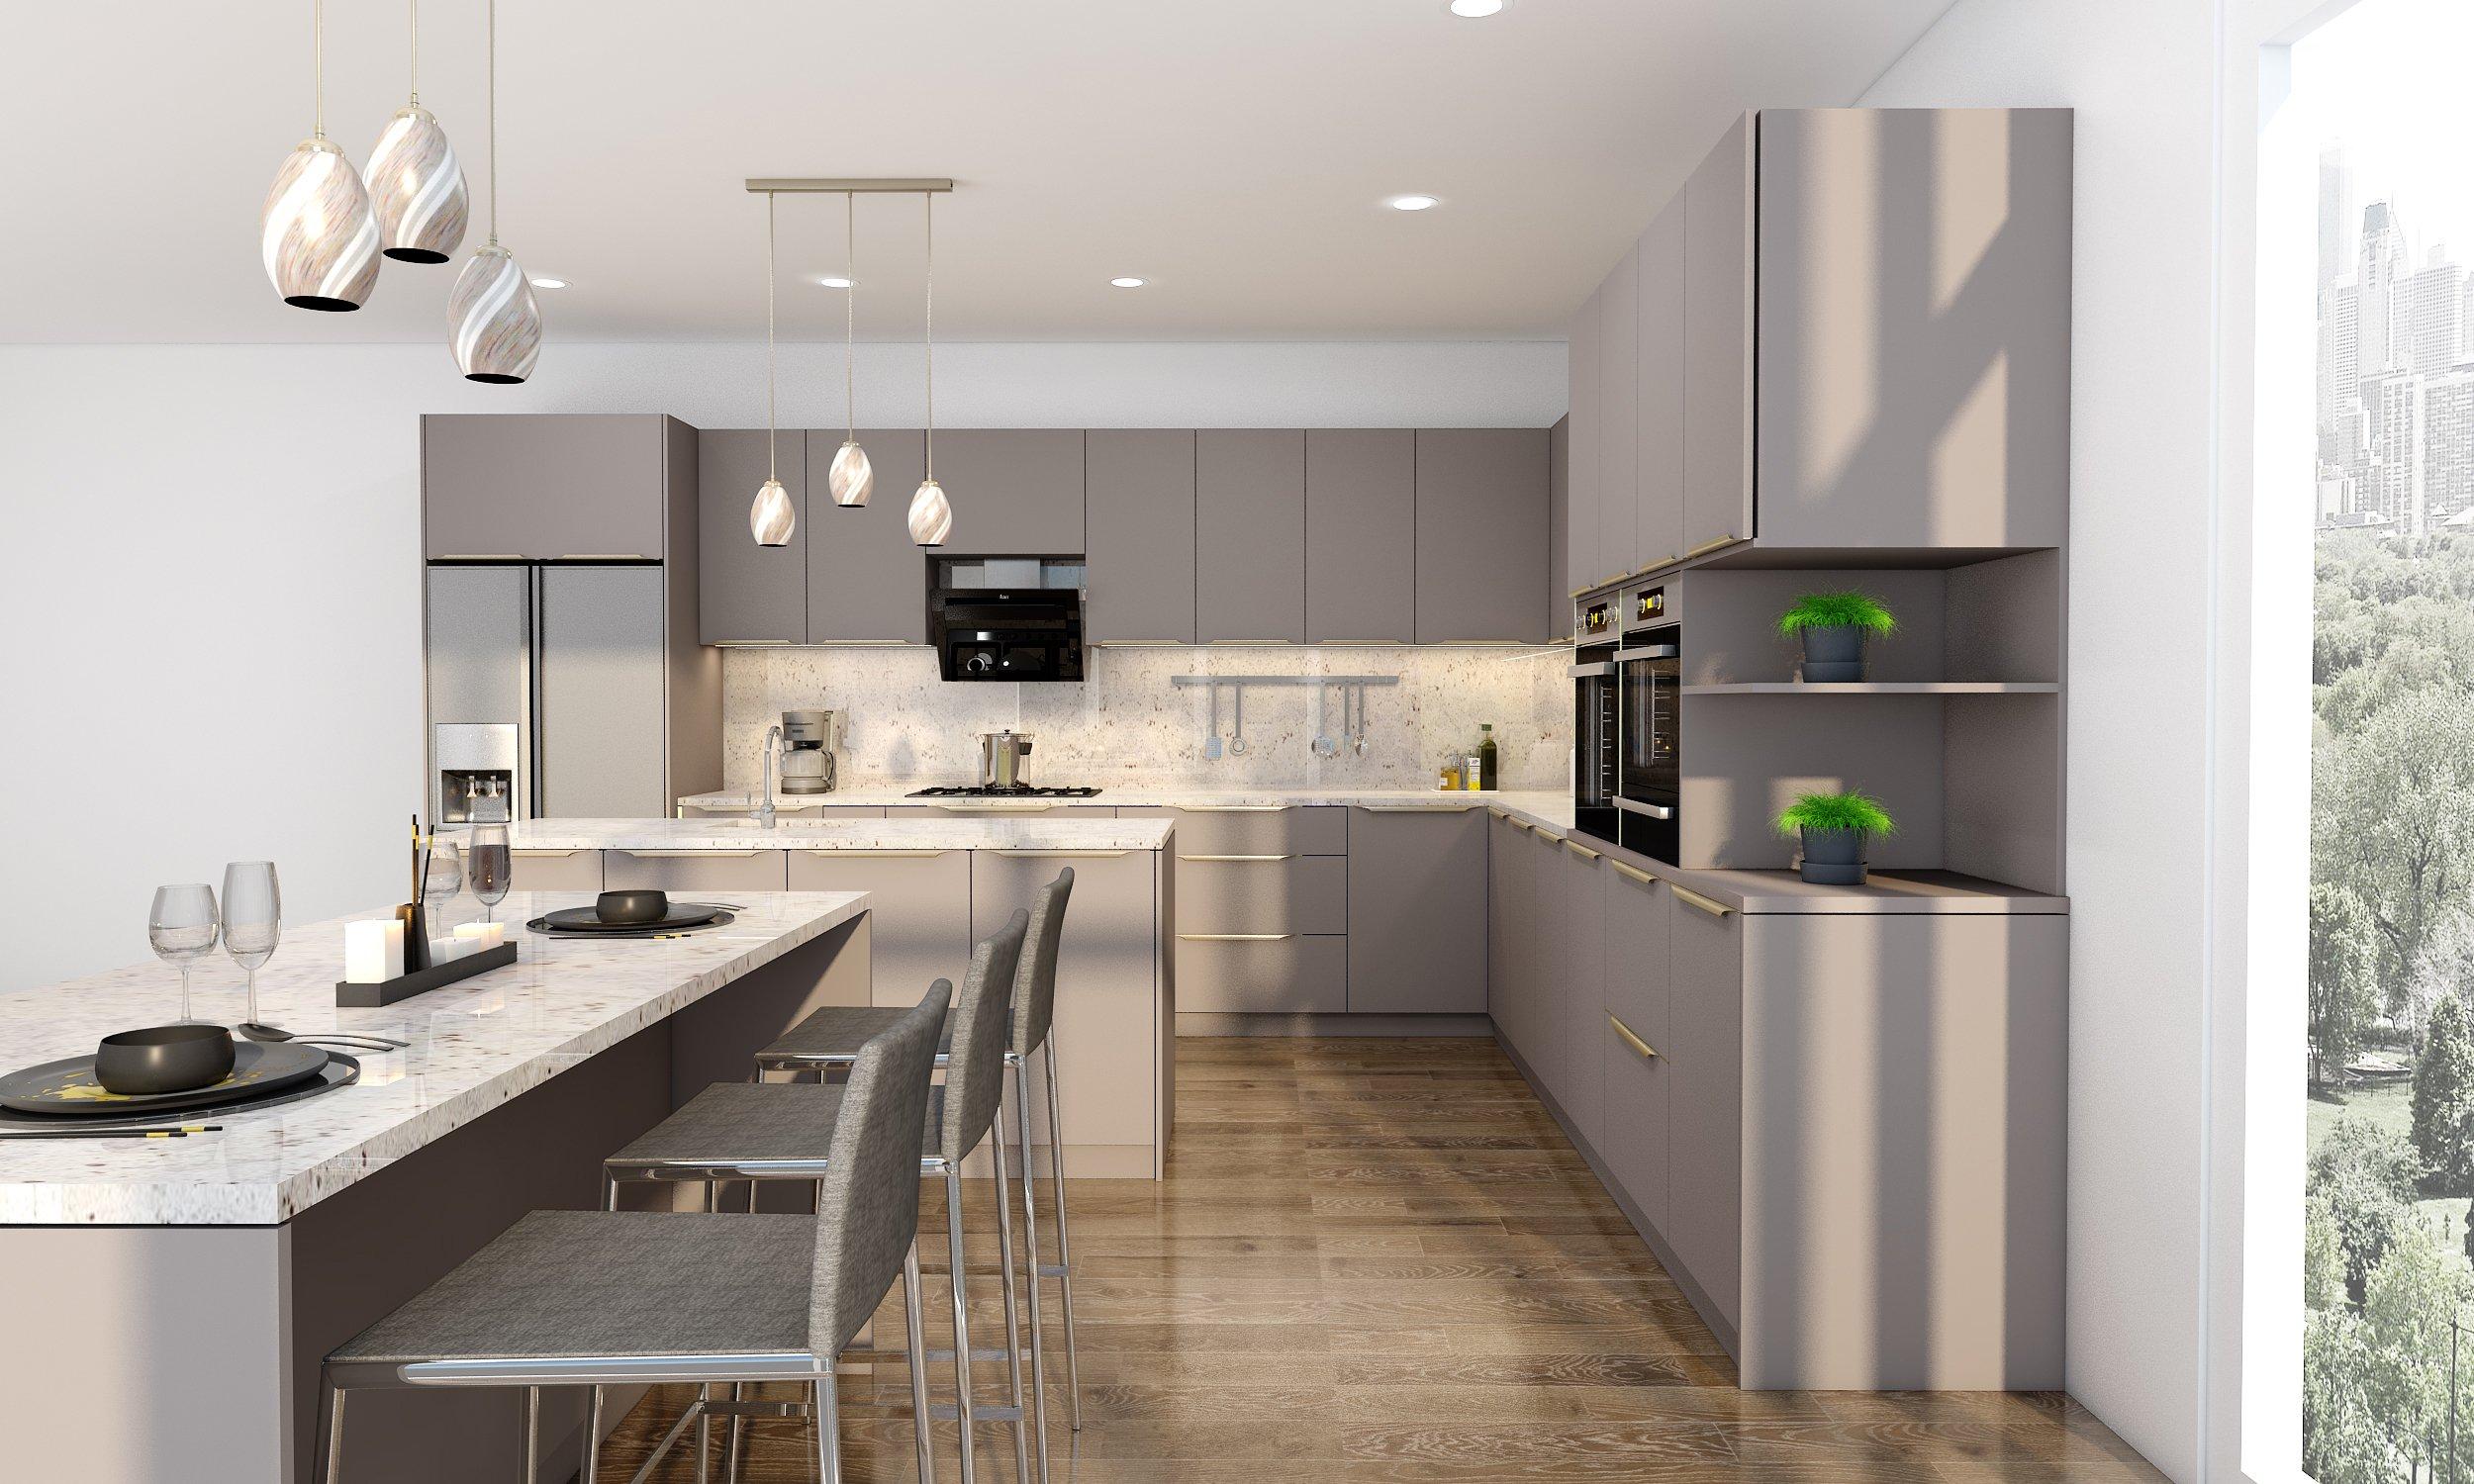 Easyline Golden Profile Handle L Shape Kitchen in Metallic-inox Finish With Double Island & Profile Gold Handle